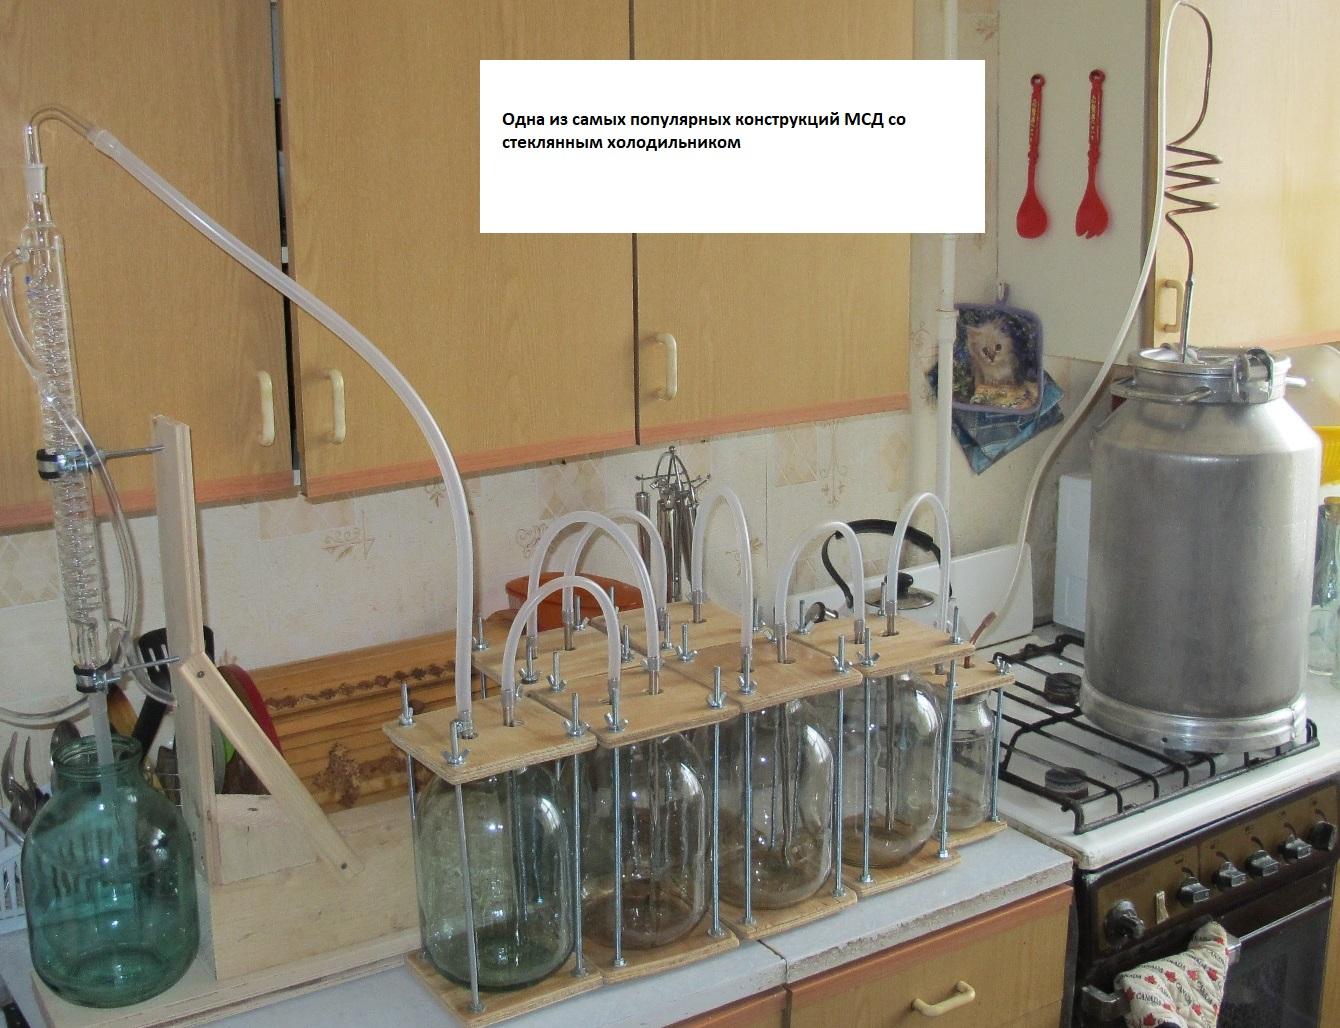 фото системы МСД в действии